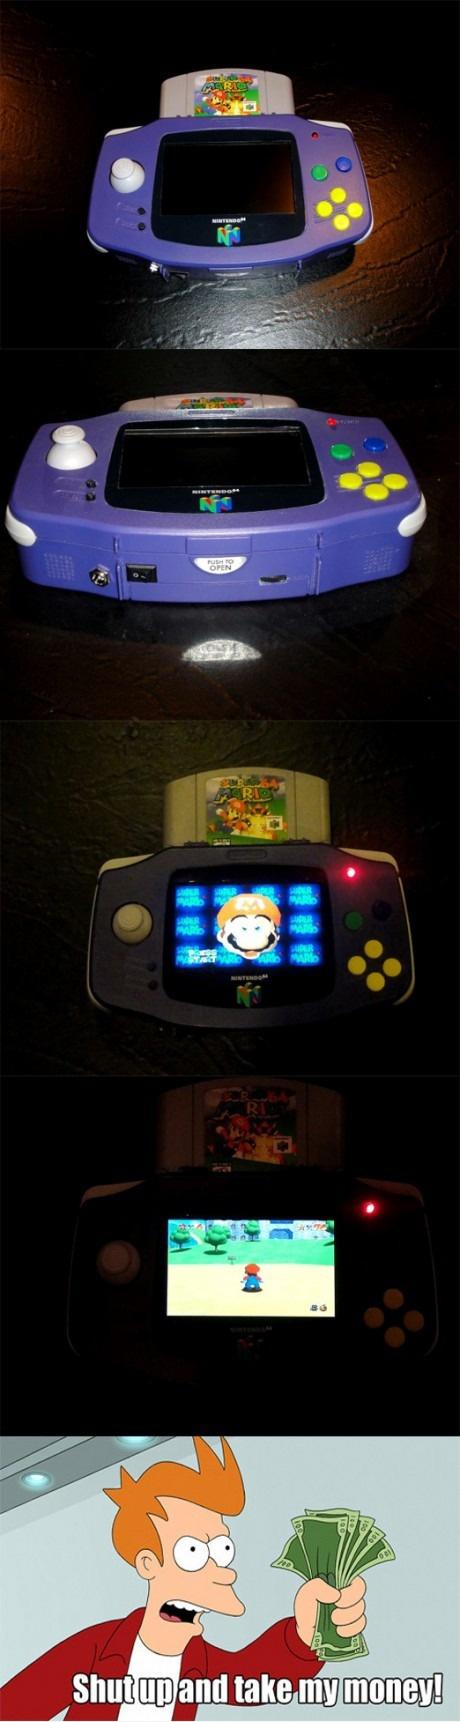 Nintendo64 Portable - Shut Up and Take My Money